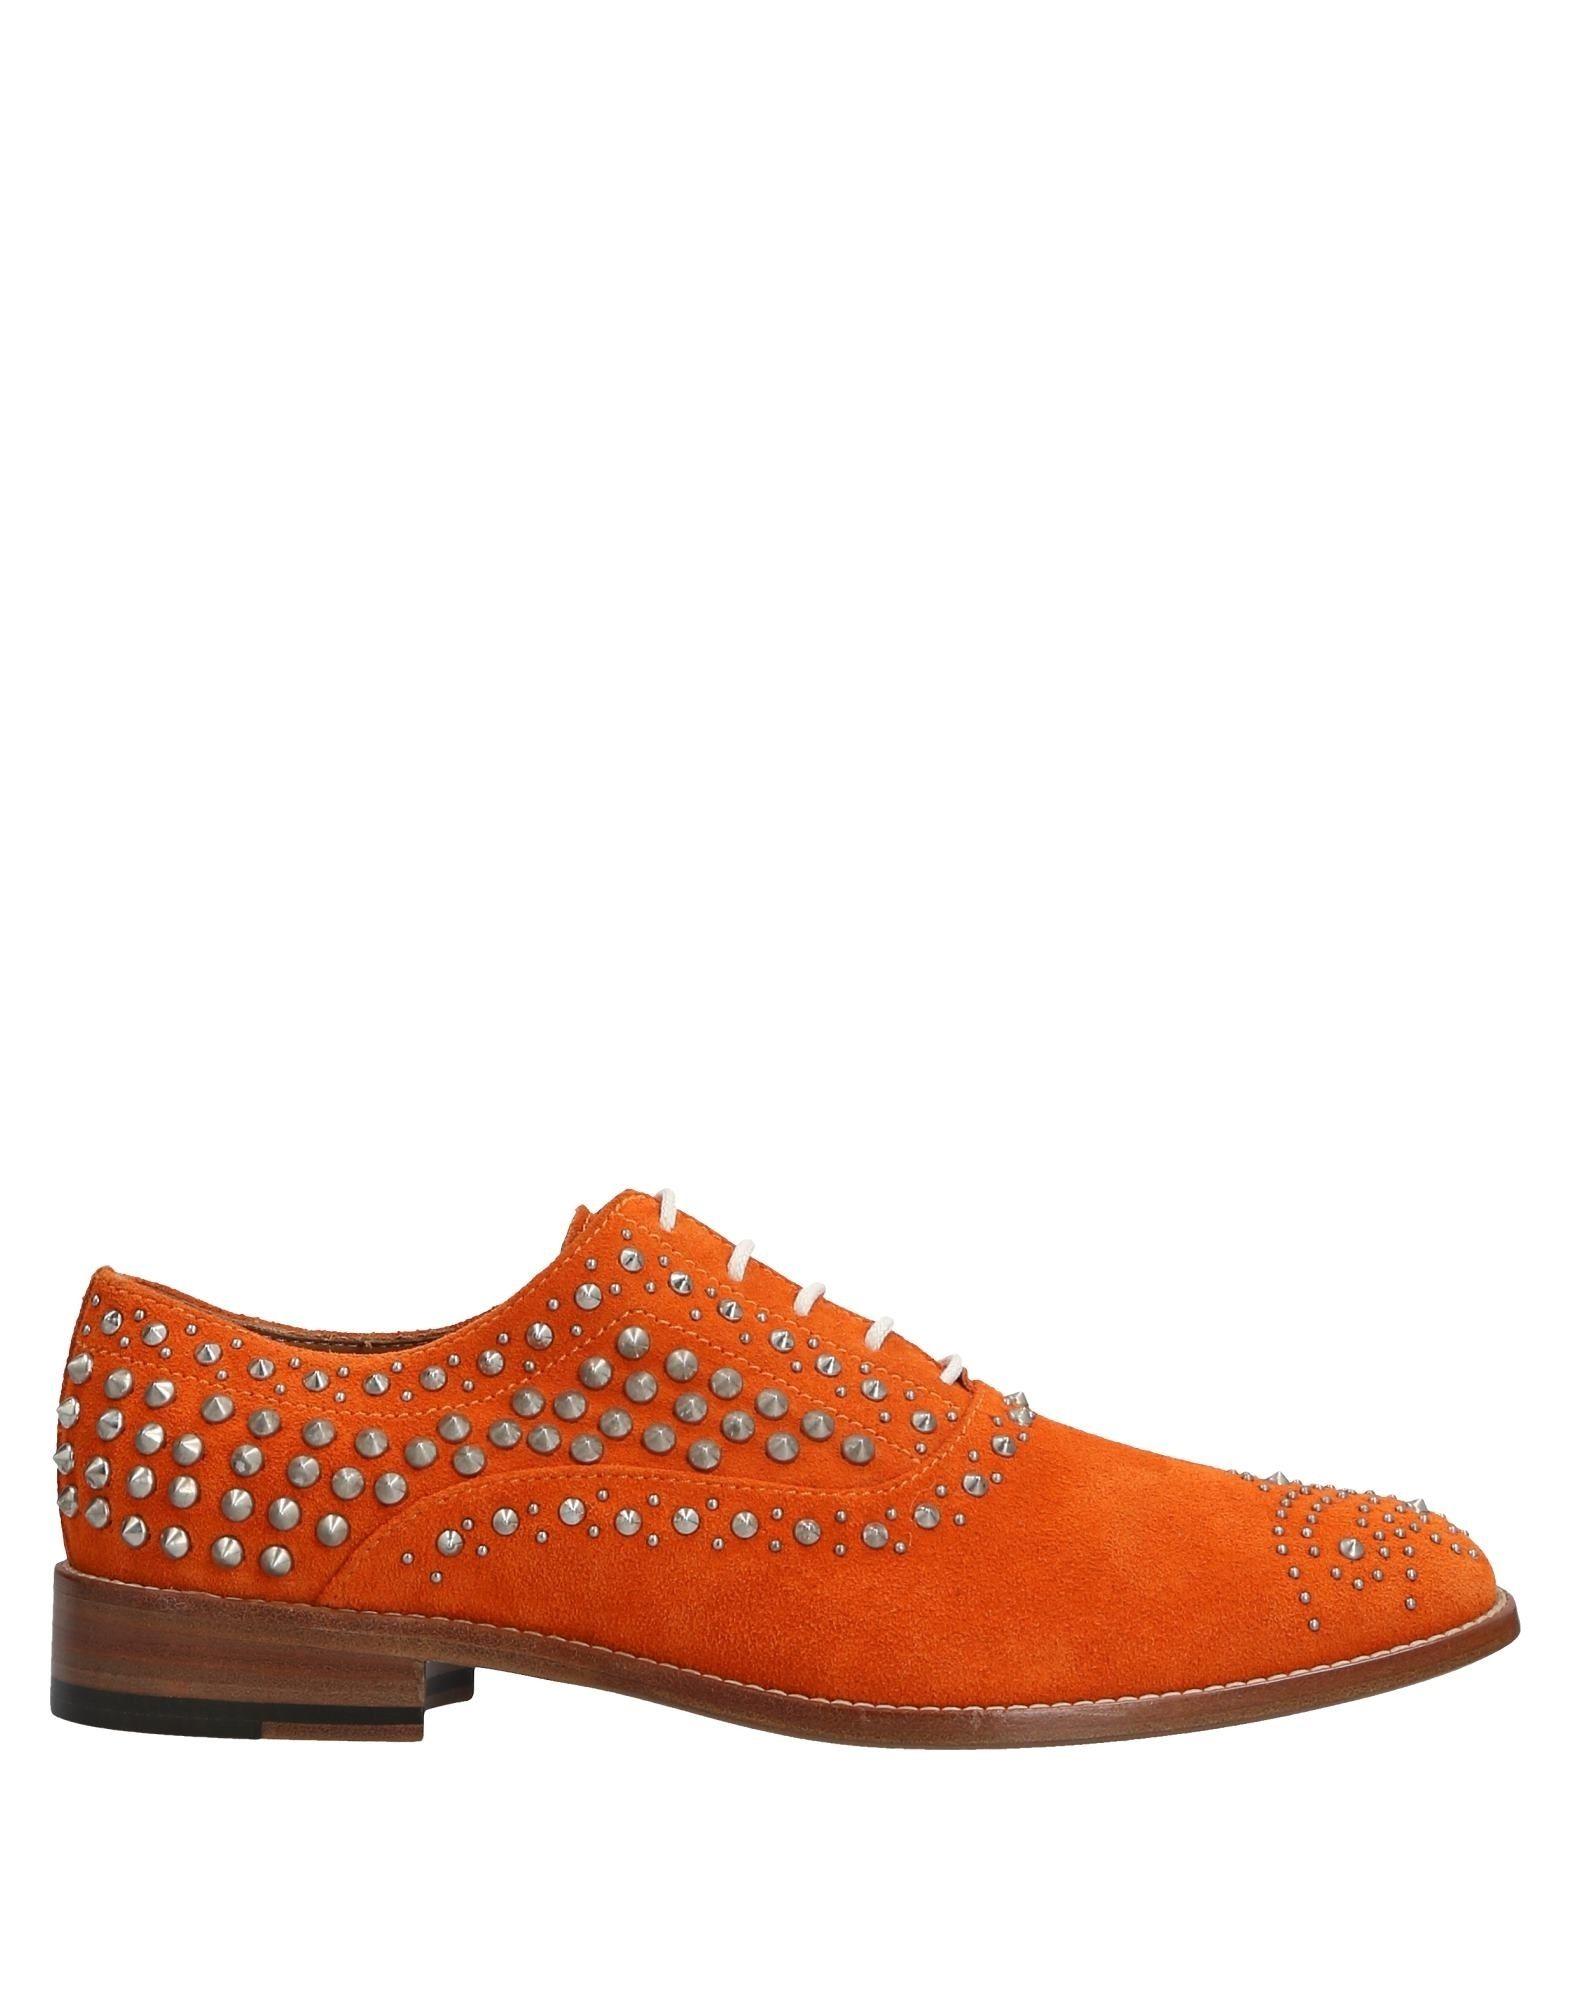 Haltbare Mode billige Schuhe Giacomorelli Schnürschuhe Damen  11531024HG Heiße Schuhe